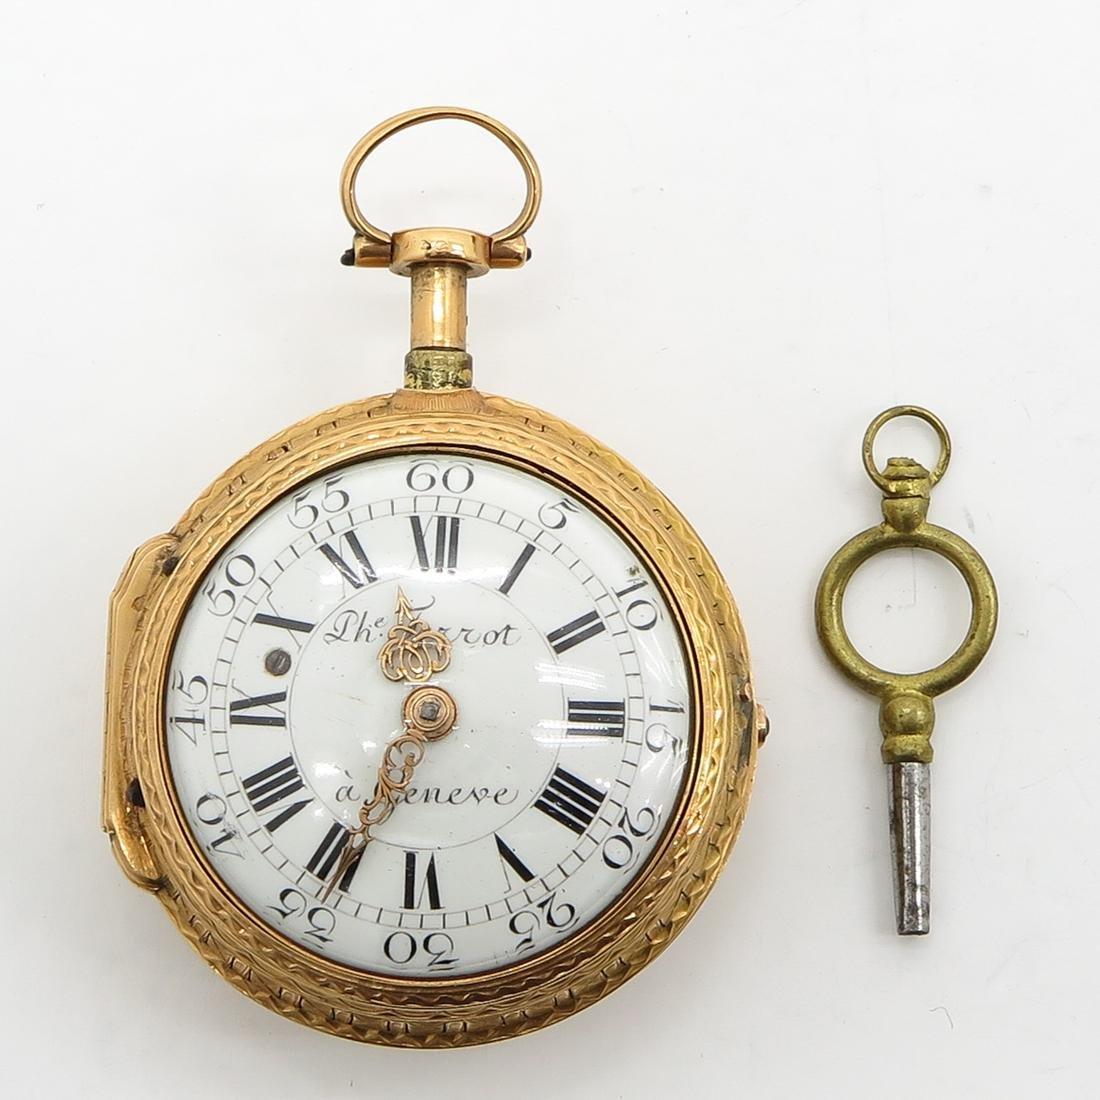 18KG Ph. Terrot & Fazy Pocket Watch Circa 1780